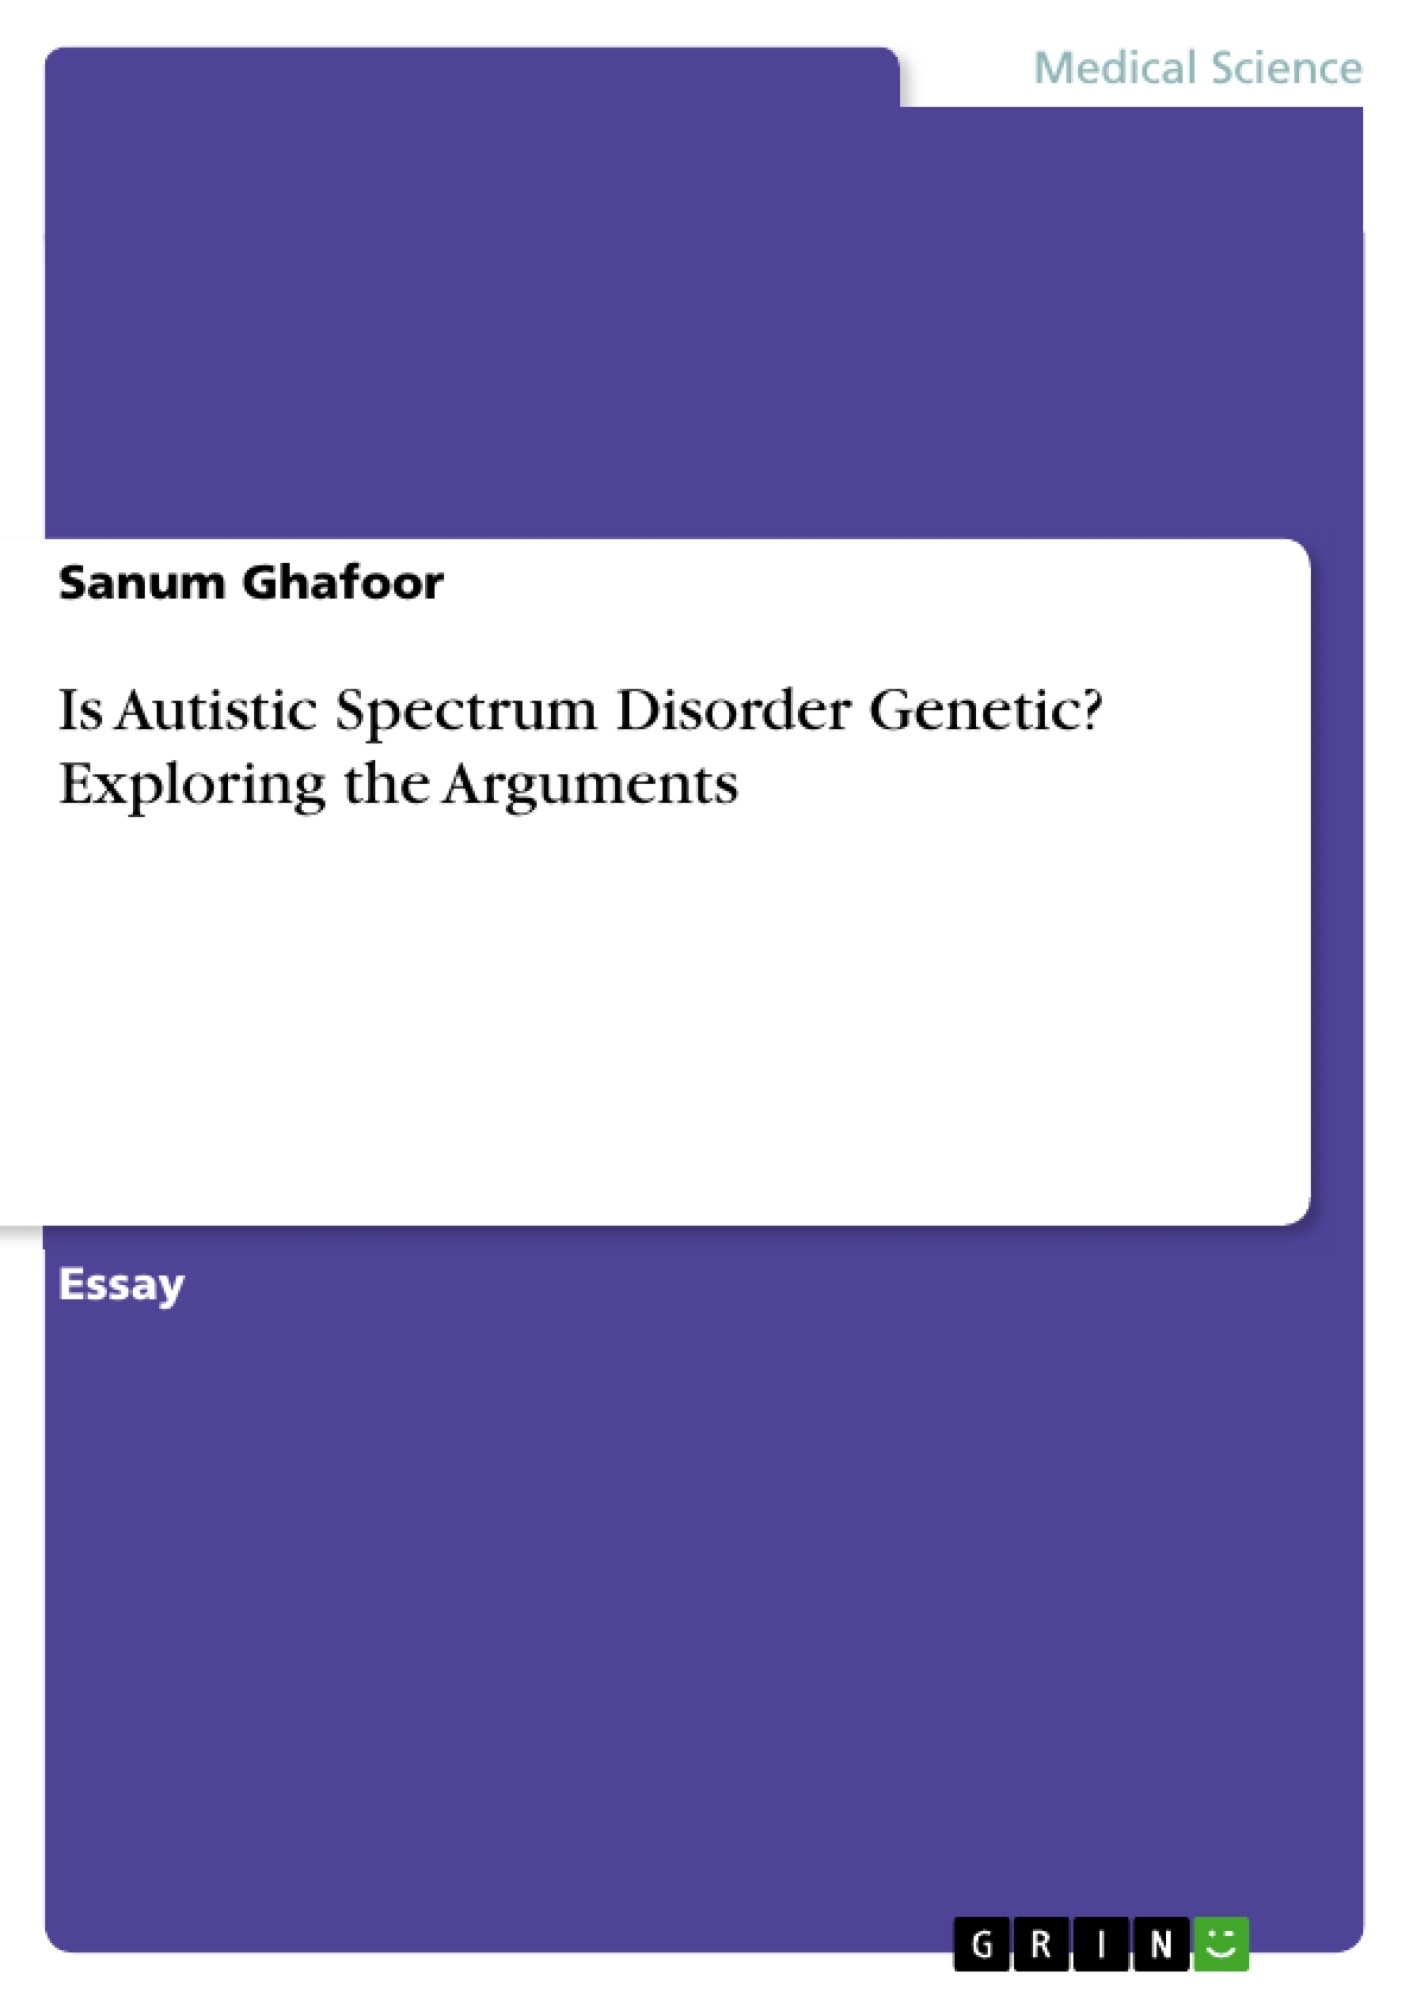 Title: Is Autistic Spectrum Disorder Genetic? Exploring the Arguments